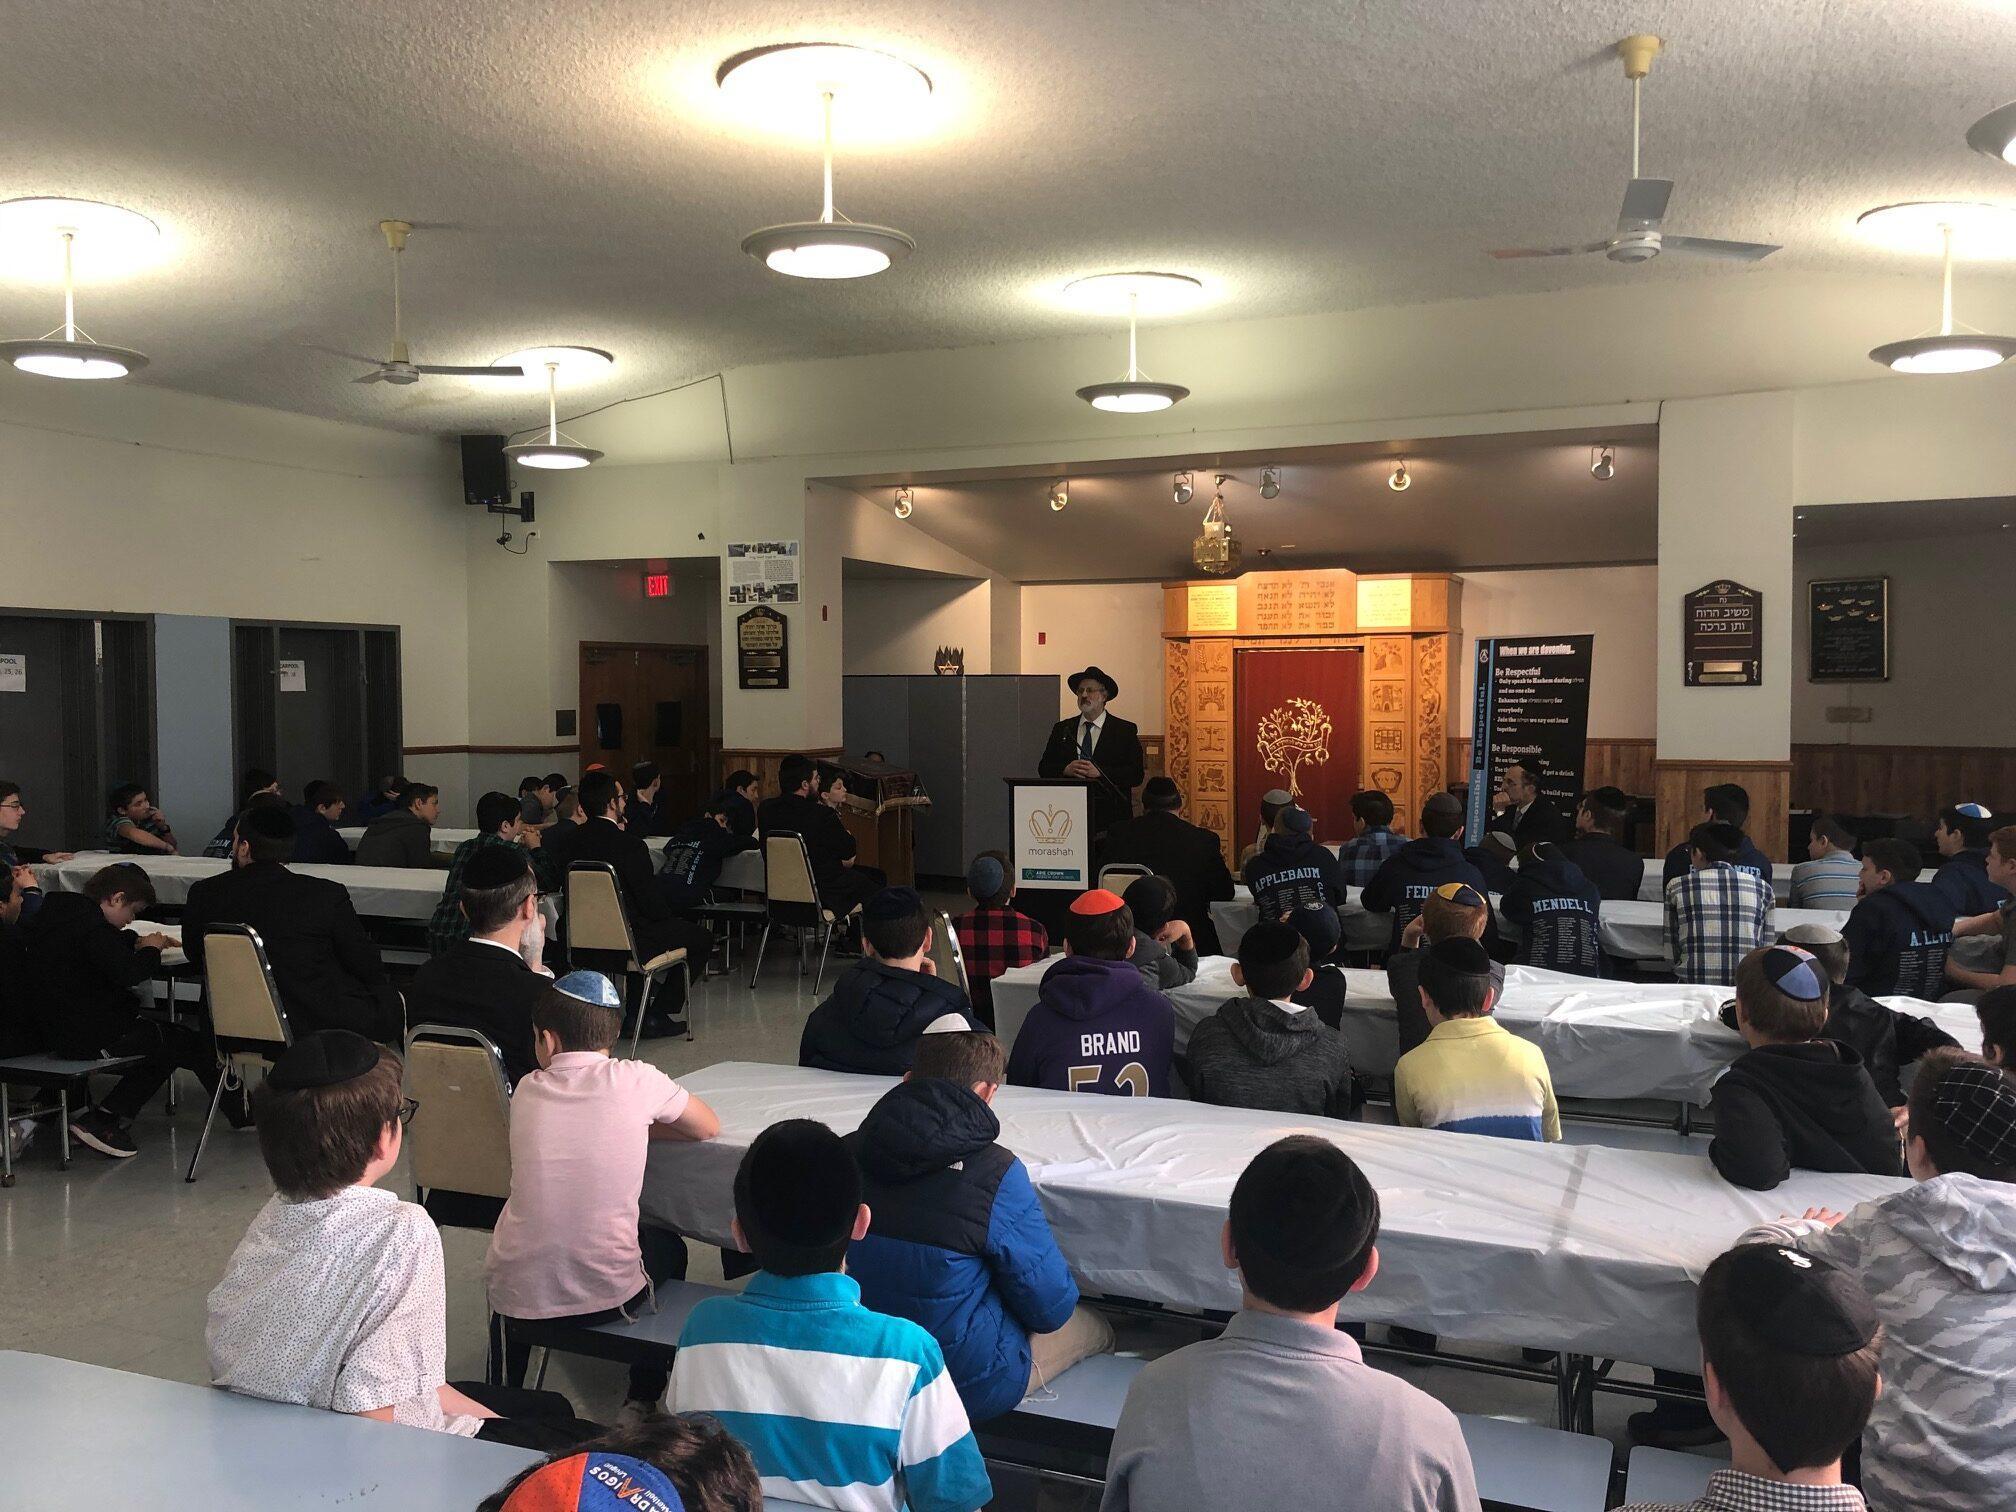 "Harav Daniel raccah speaking at Arie Crown Hebrew day school and Yeshiva Tiferes Tzvi about Chacham Ovadia Yosef ZT""L Ovadia Yosef ZT""L"